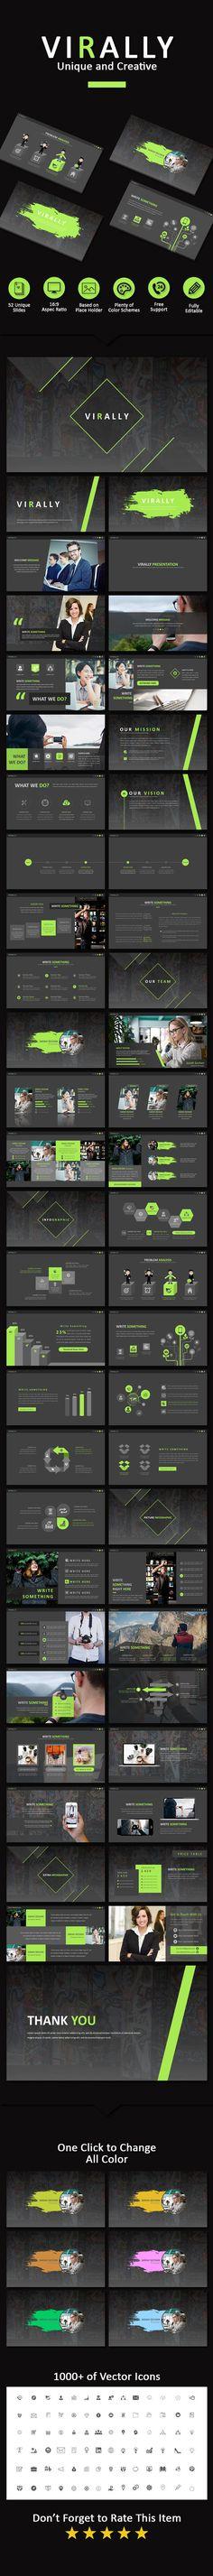 Virally Creative Powerpoint - Business PowerPoint Templates